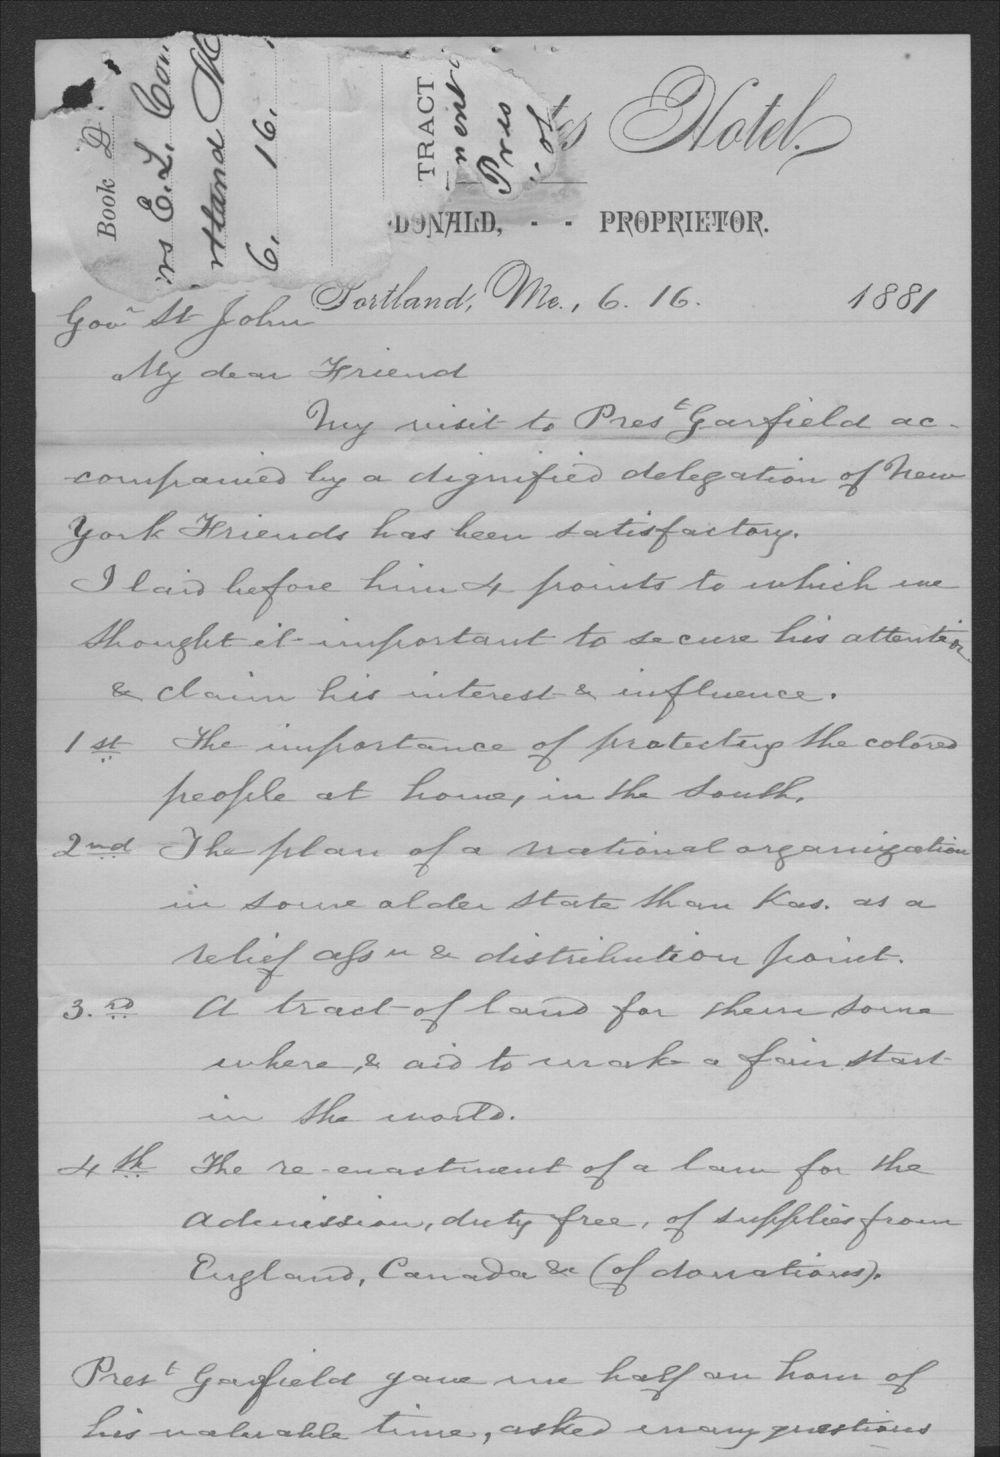 Elizabeth Comstock to John P. St. John - 1